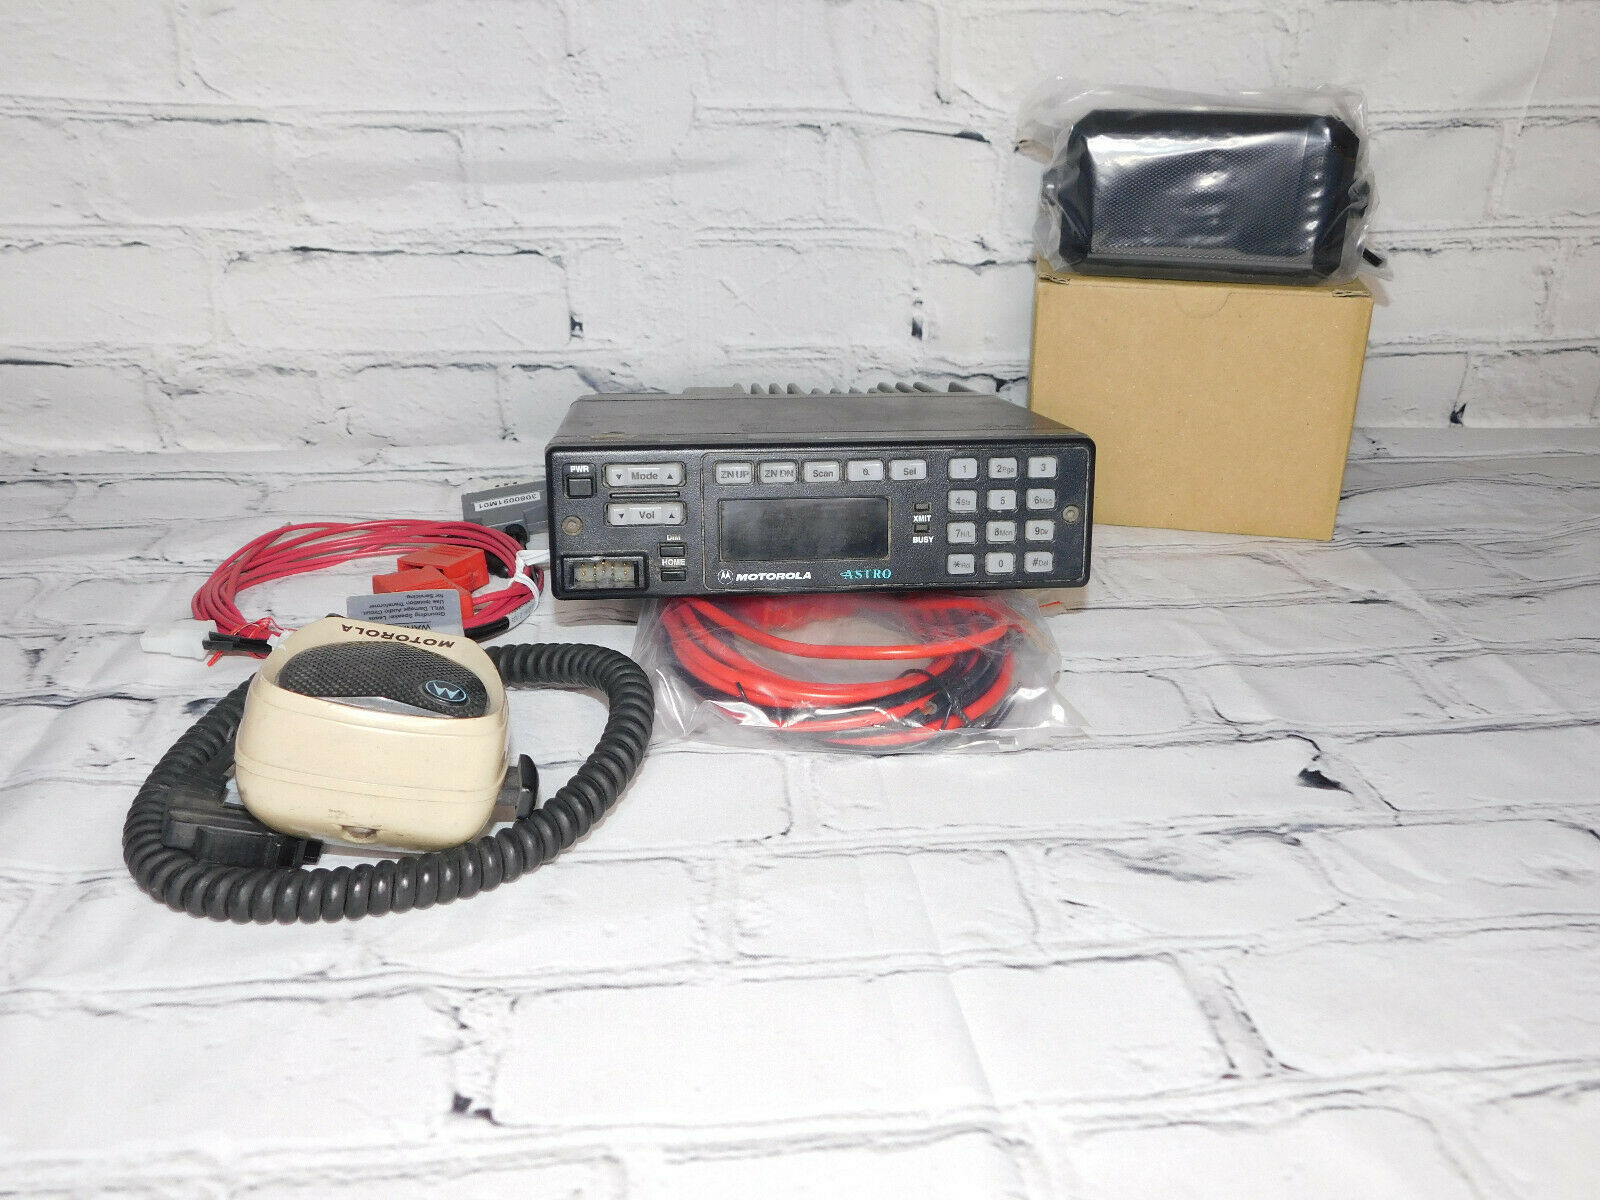 Motorola VHF Astro spectra W7 P25 Digital Mobile radio W/ AES/DES Encryption . Available Now for 150.00